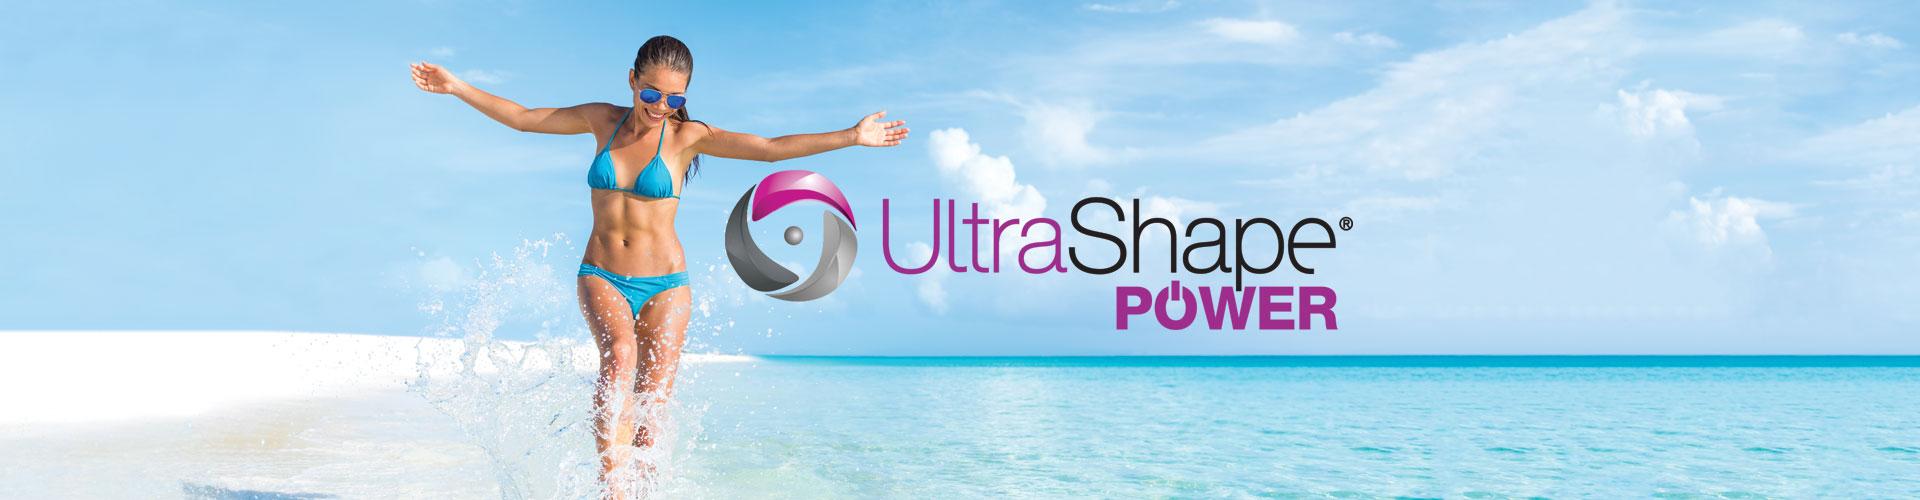 ultrashape power orlando